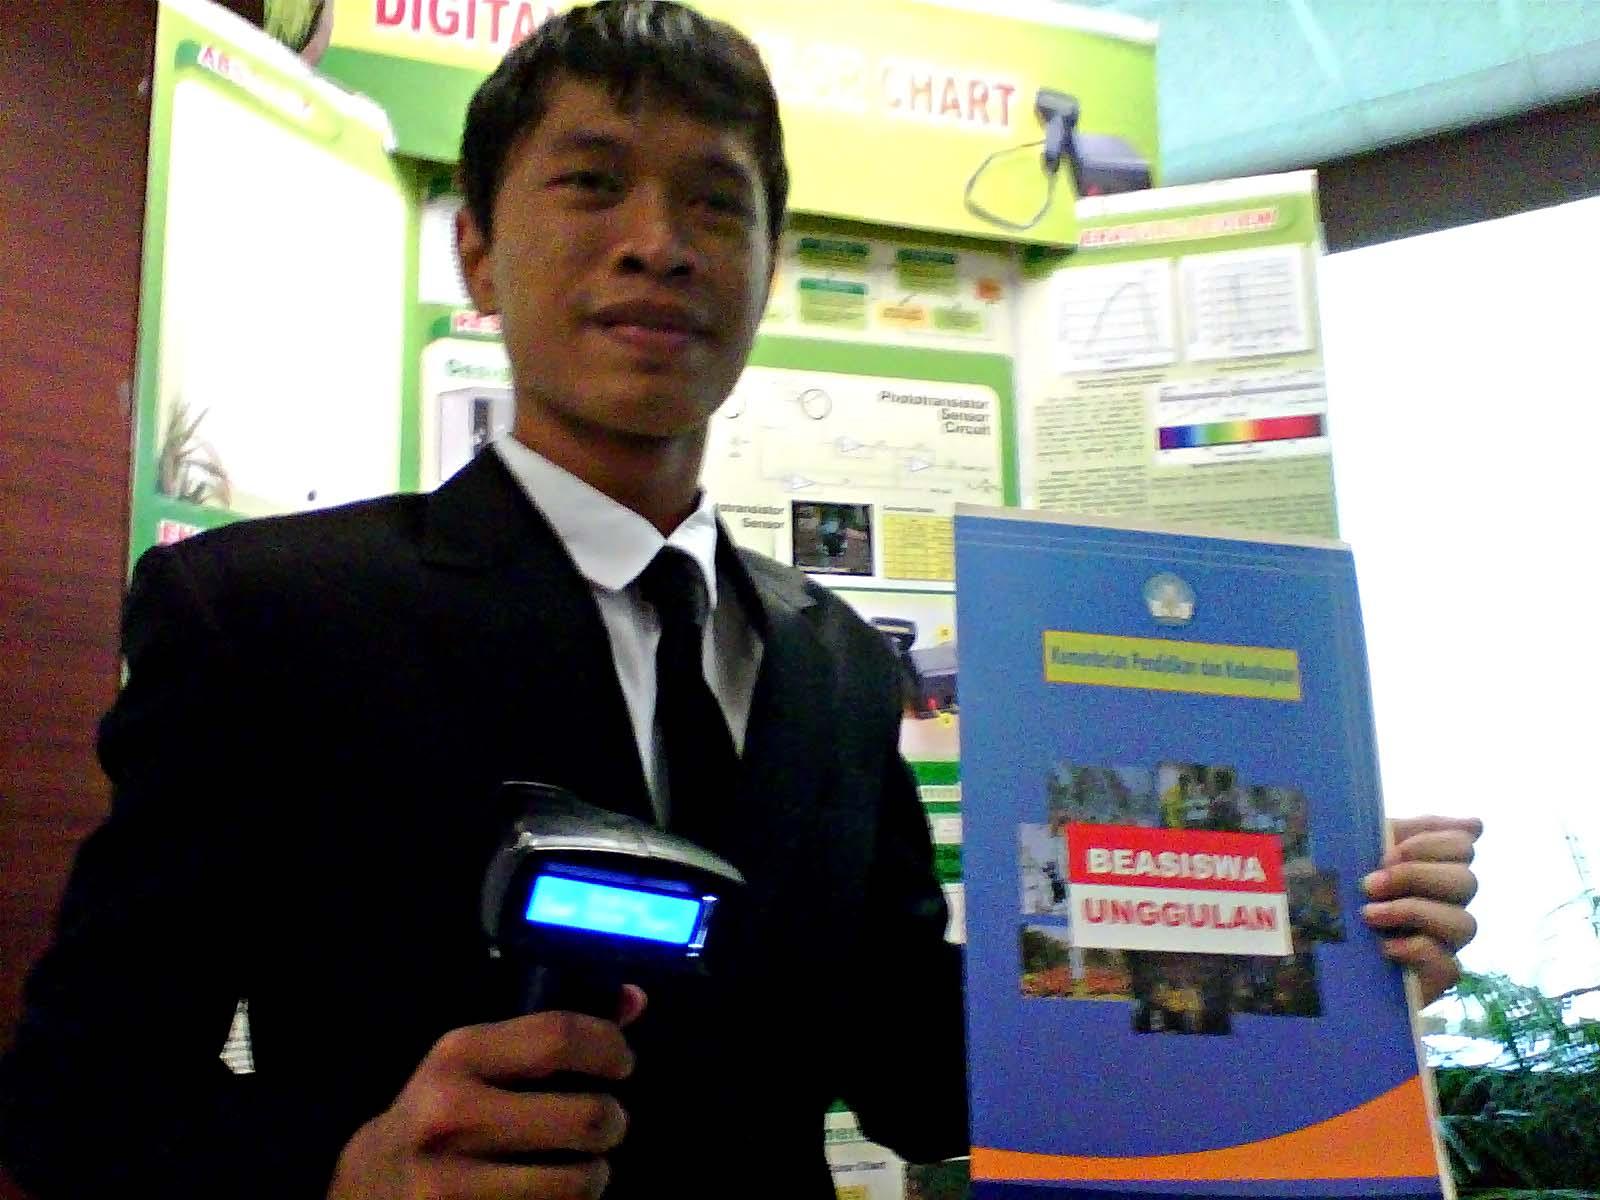 seorang pelajar Indonesia, mampu mengharumkan nama bangsa